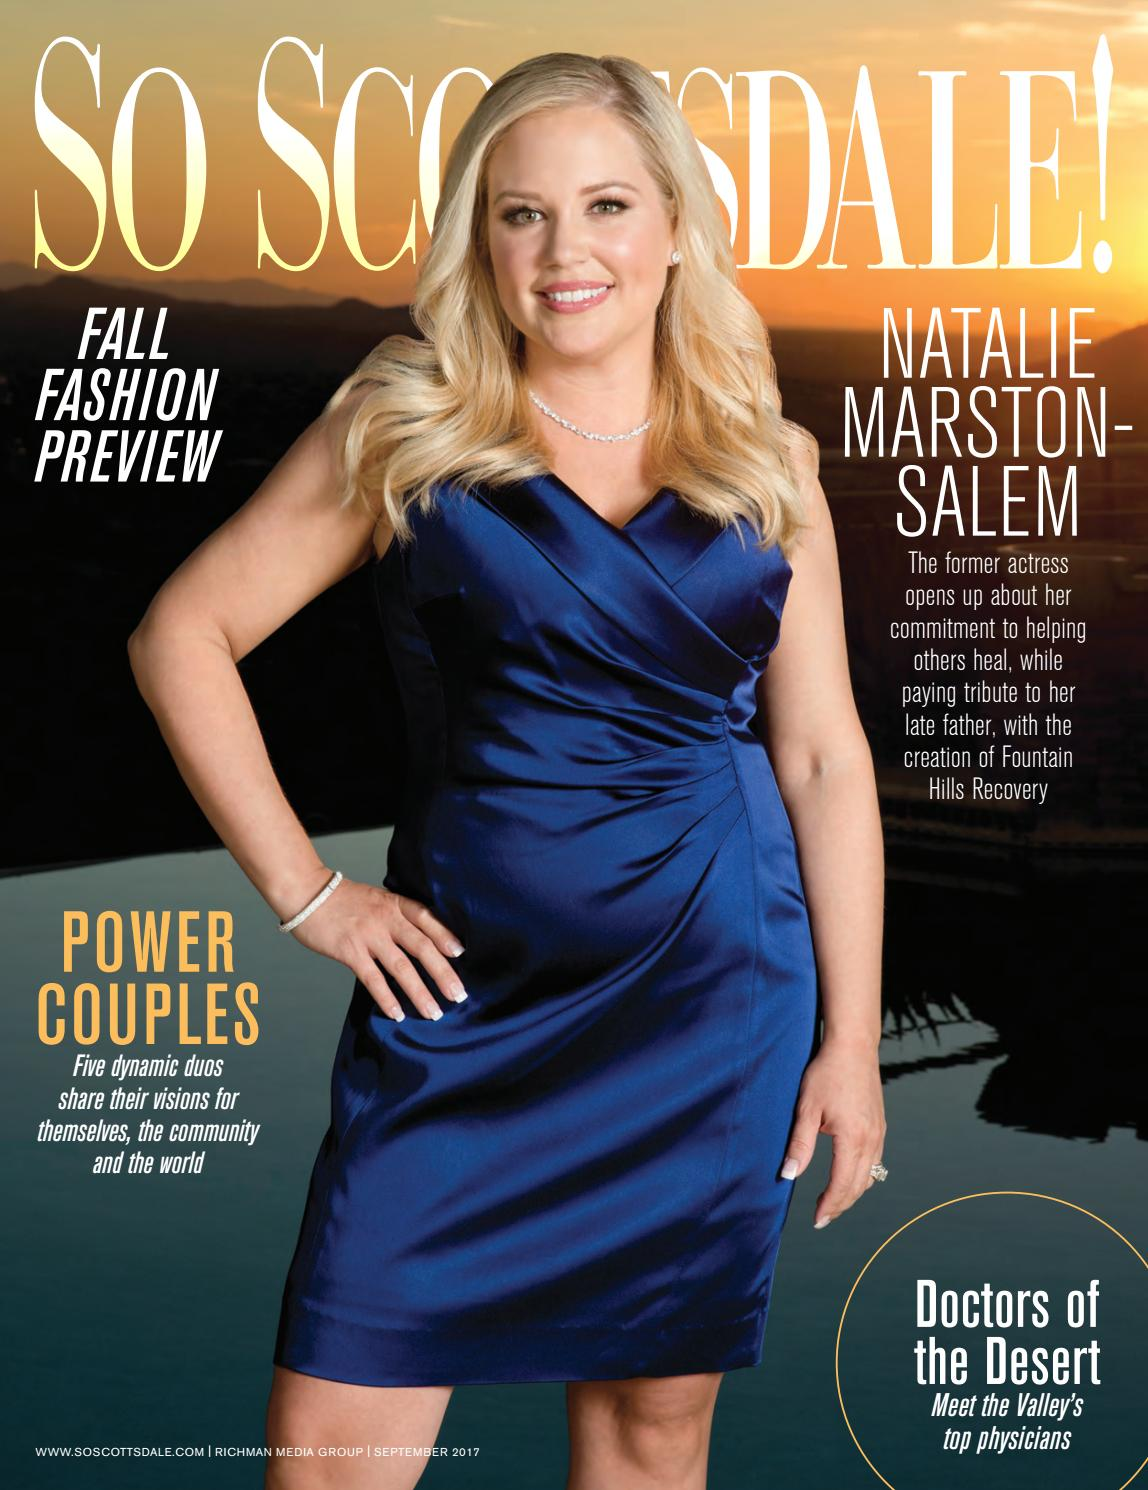 90a1dfed2e3e2 So Scottsdale September 2017 by Richman Media Group - issuu